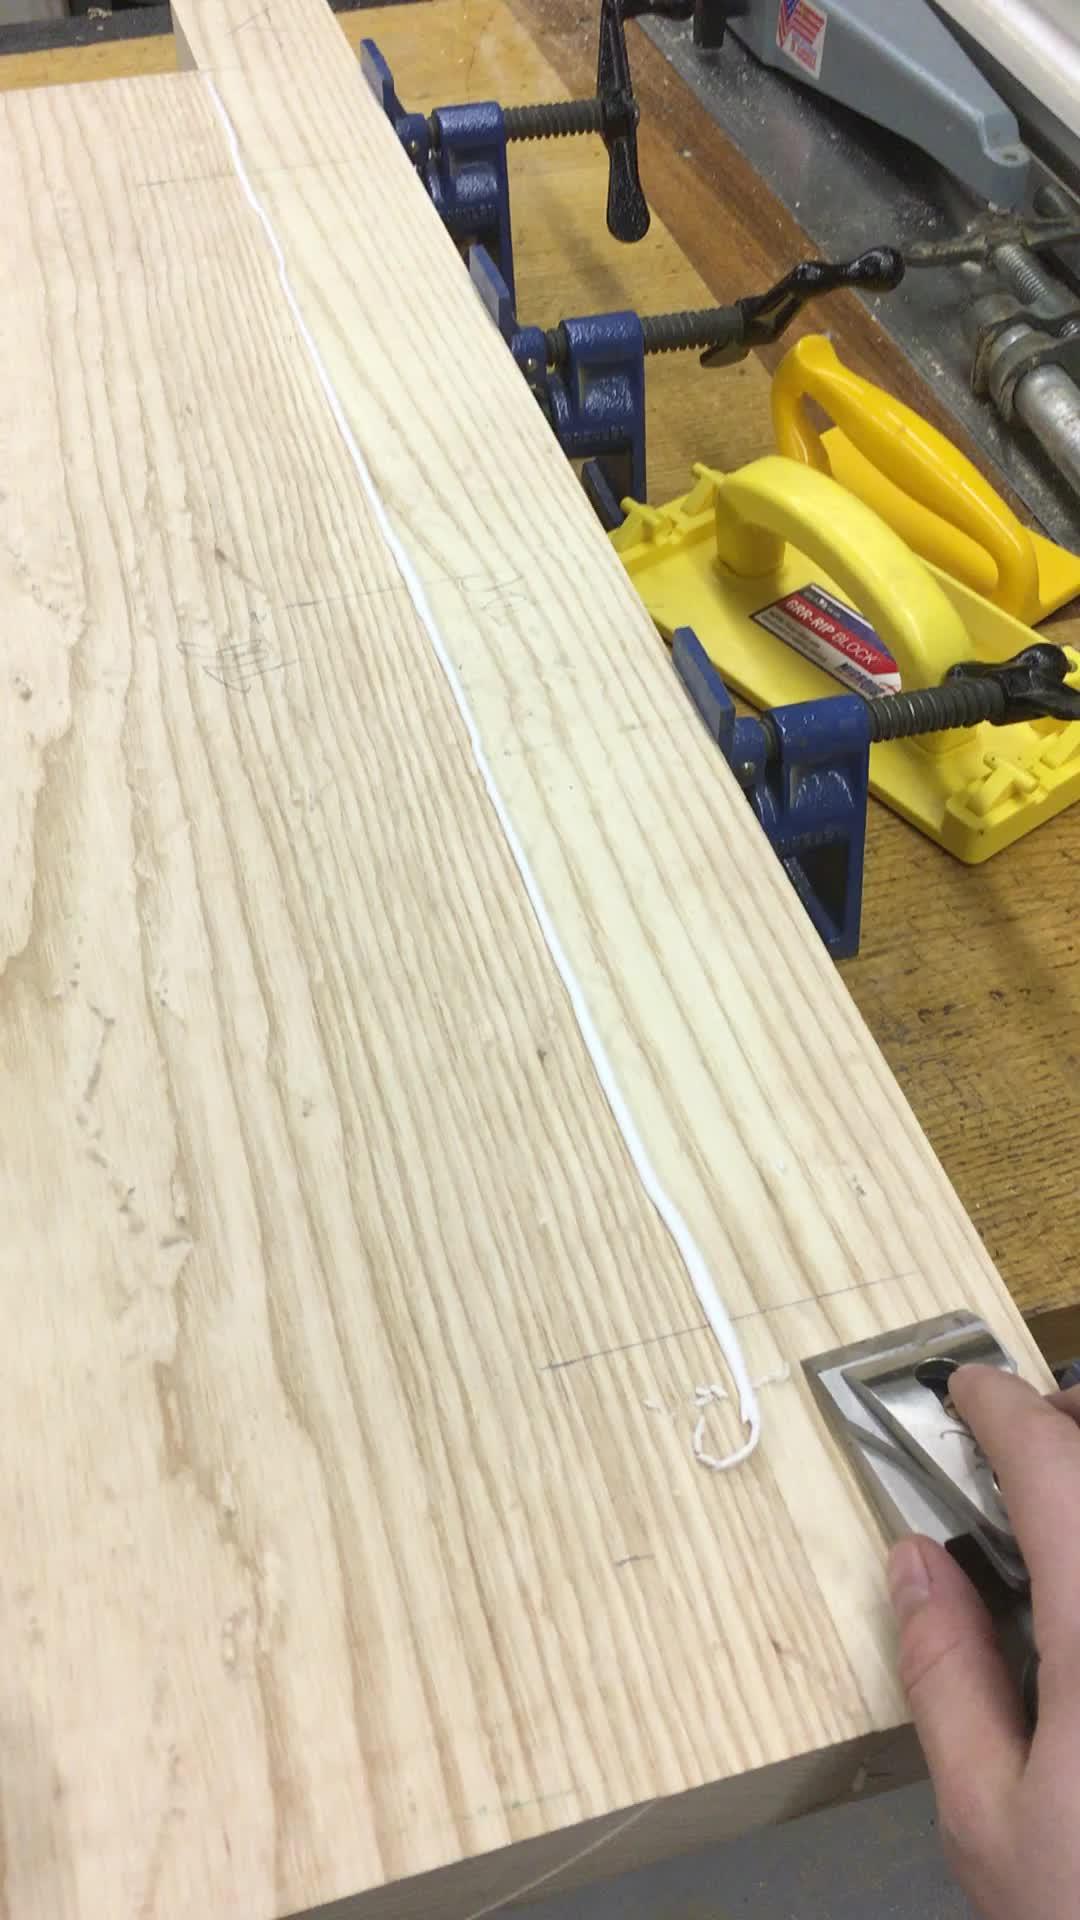 oddlysatisfying, woodworking, so satisfying... GIFs